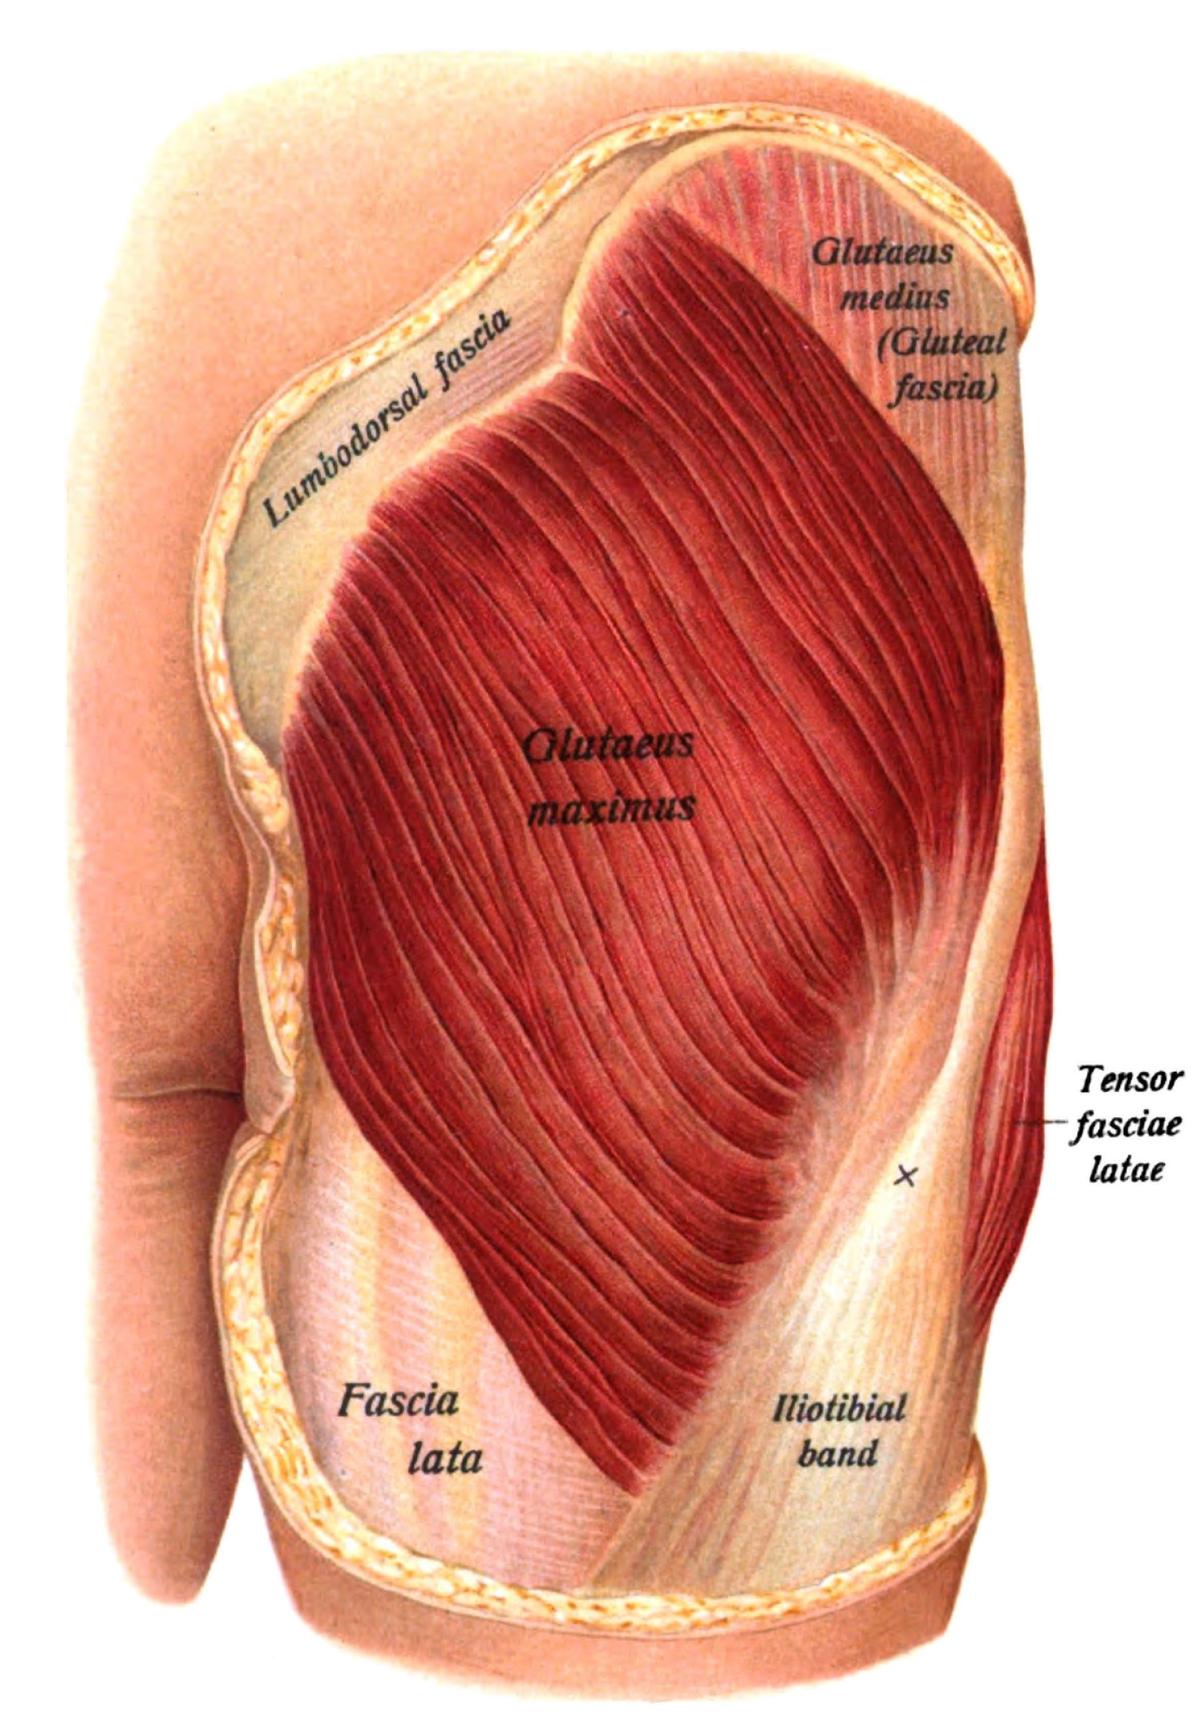 Gluteus maximus muscle - Wikipedia